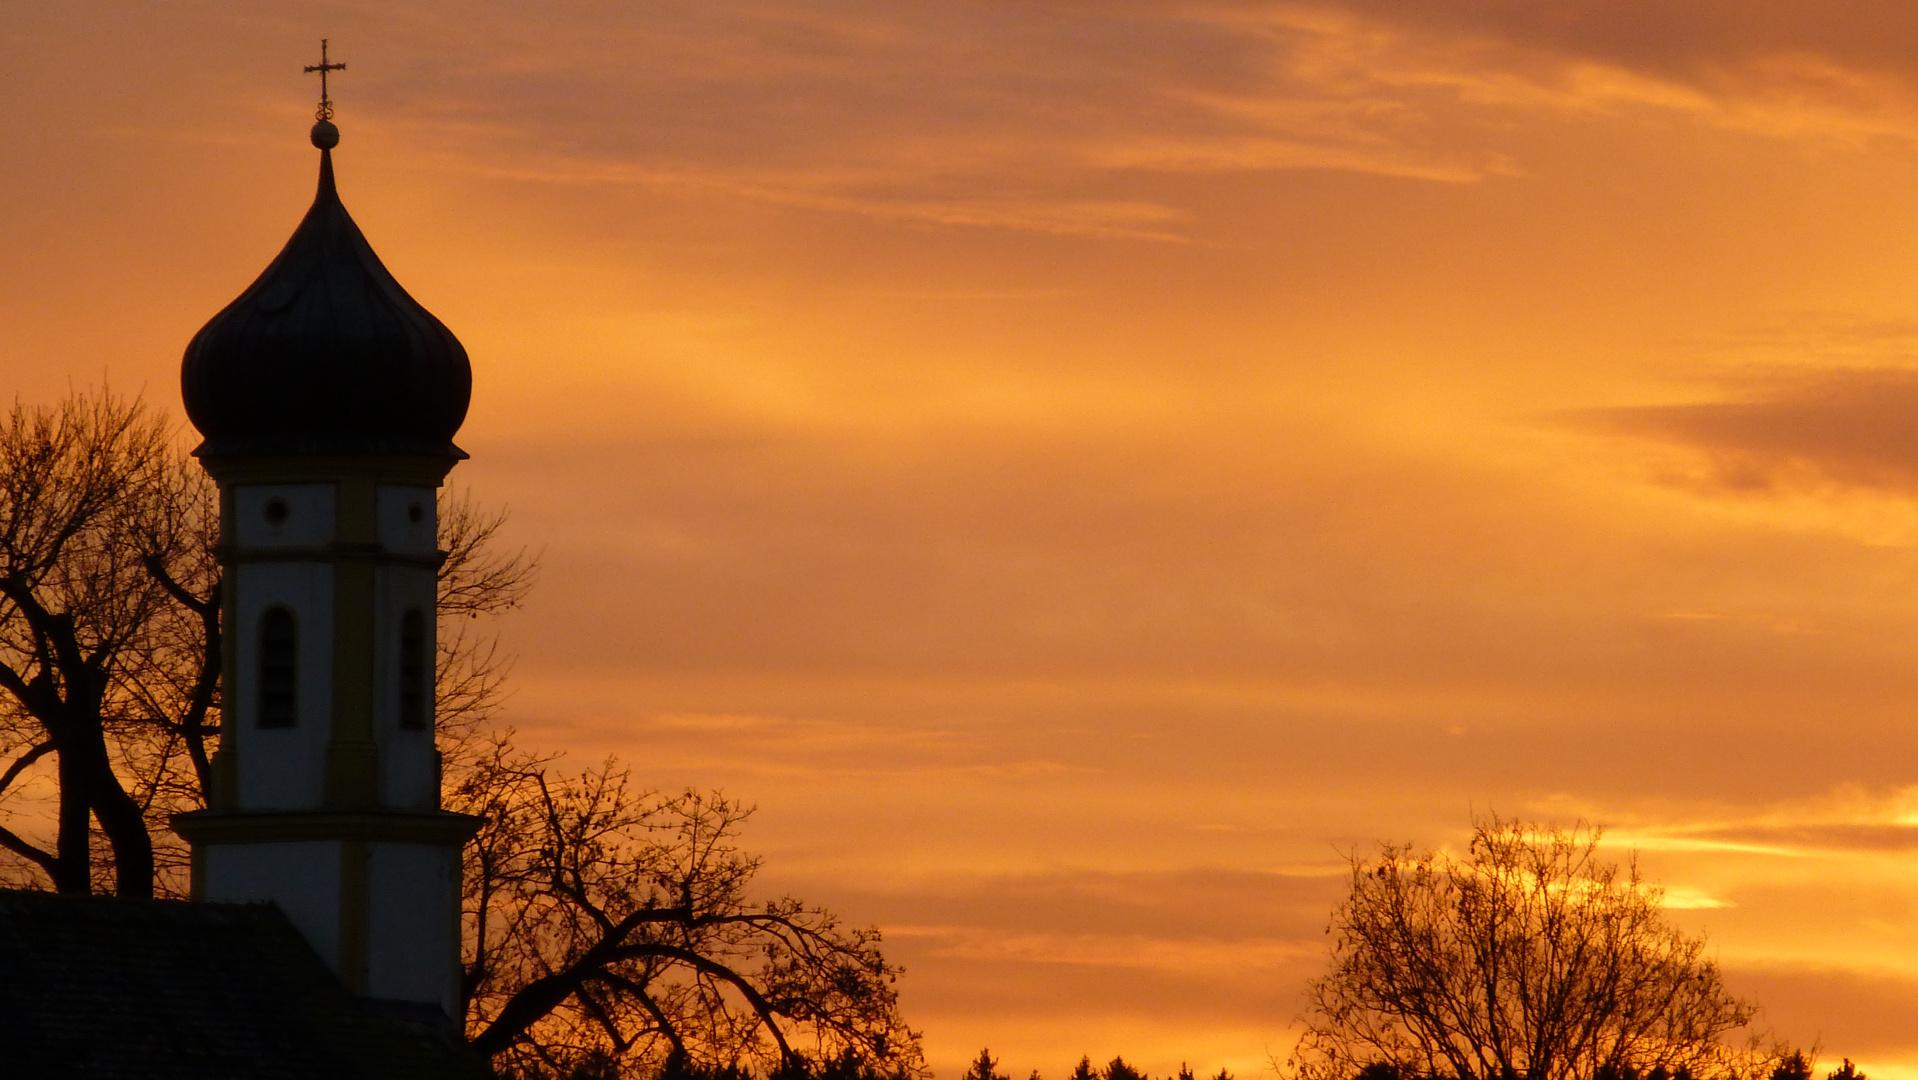 Dämmerung am Heiligen Abend 2012